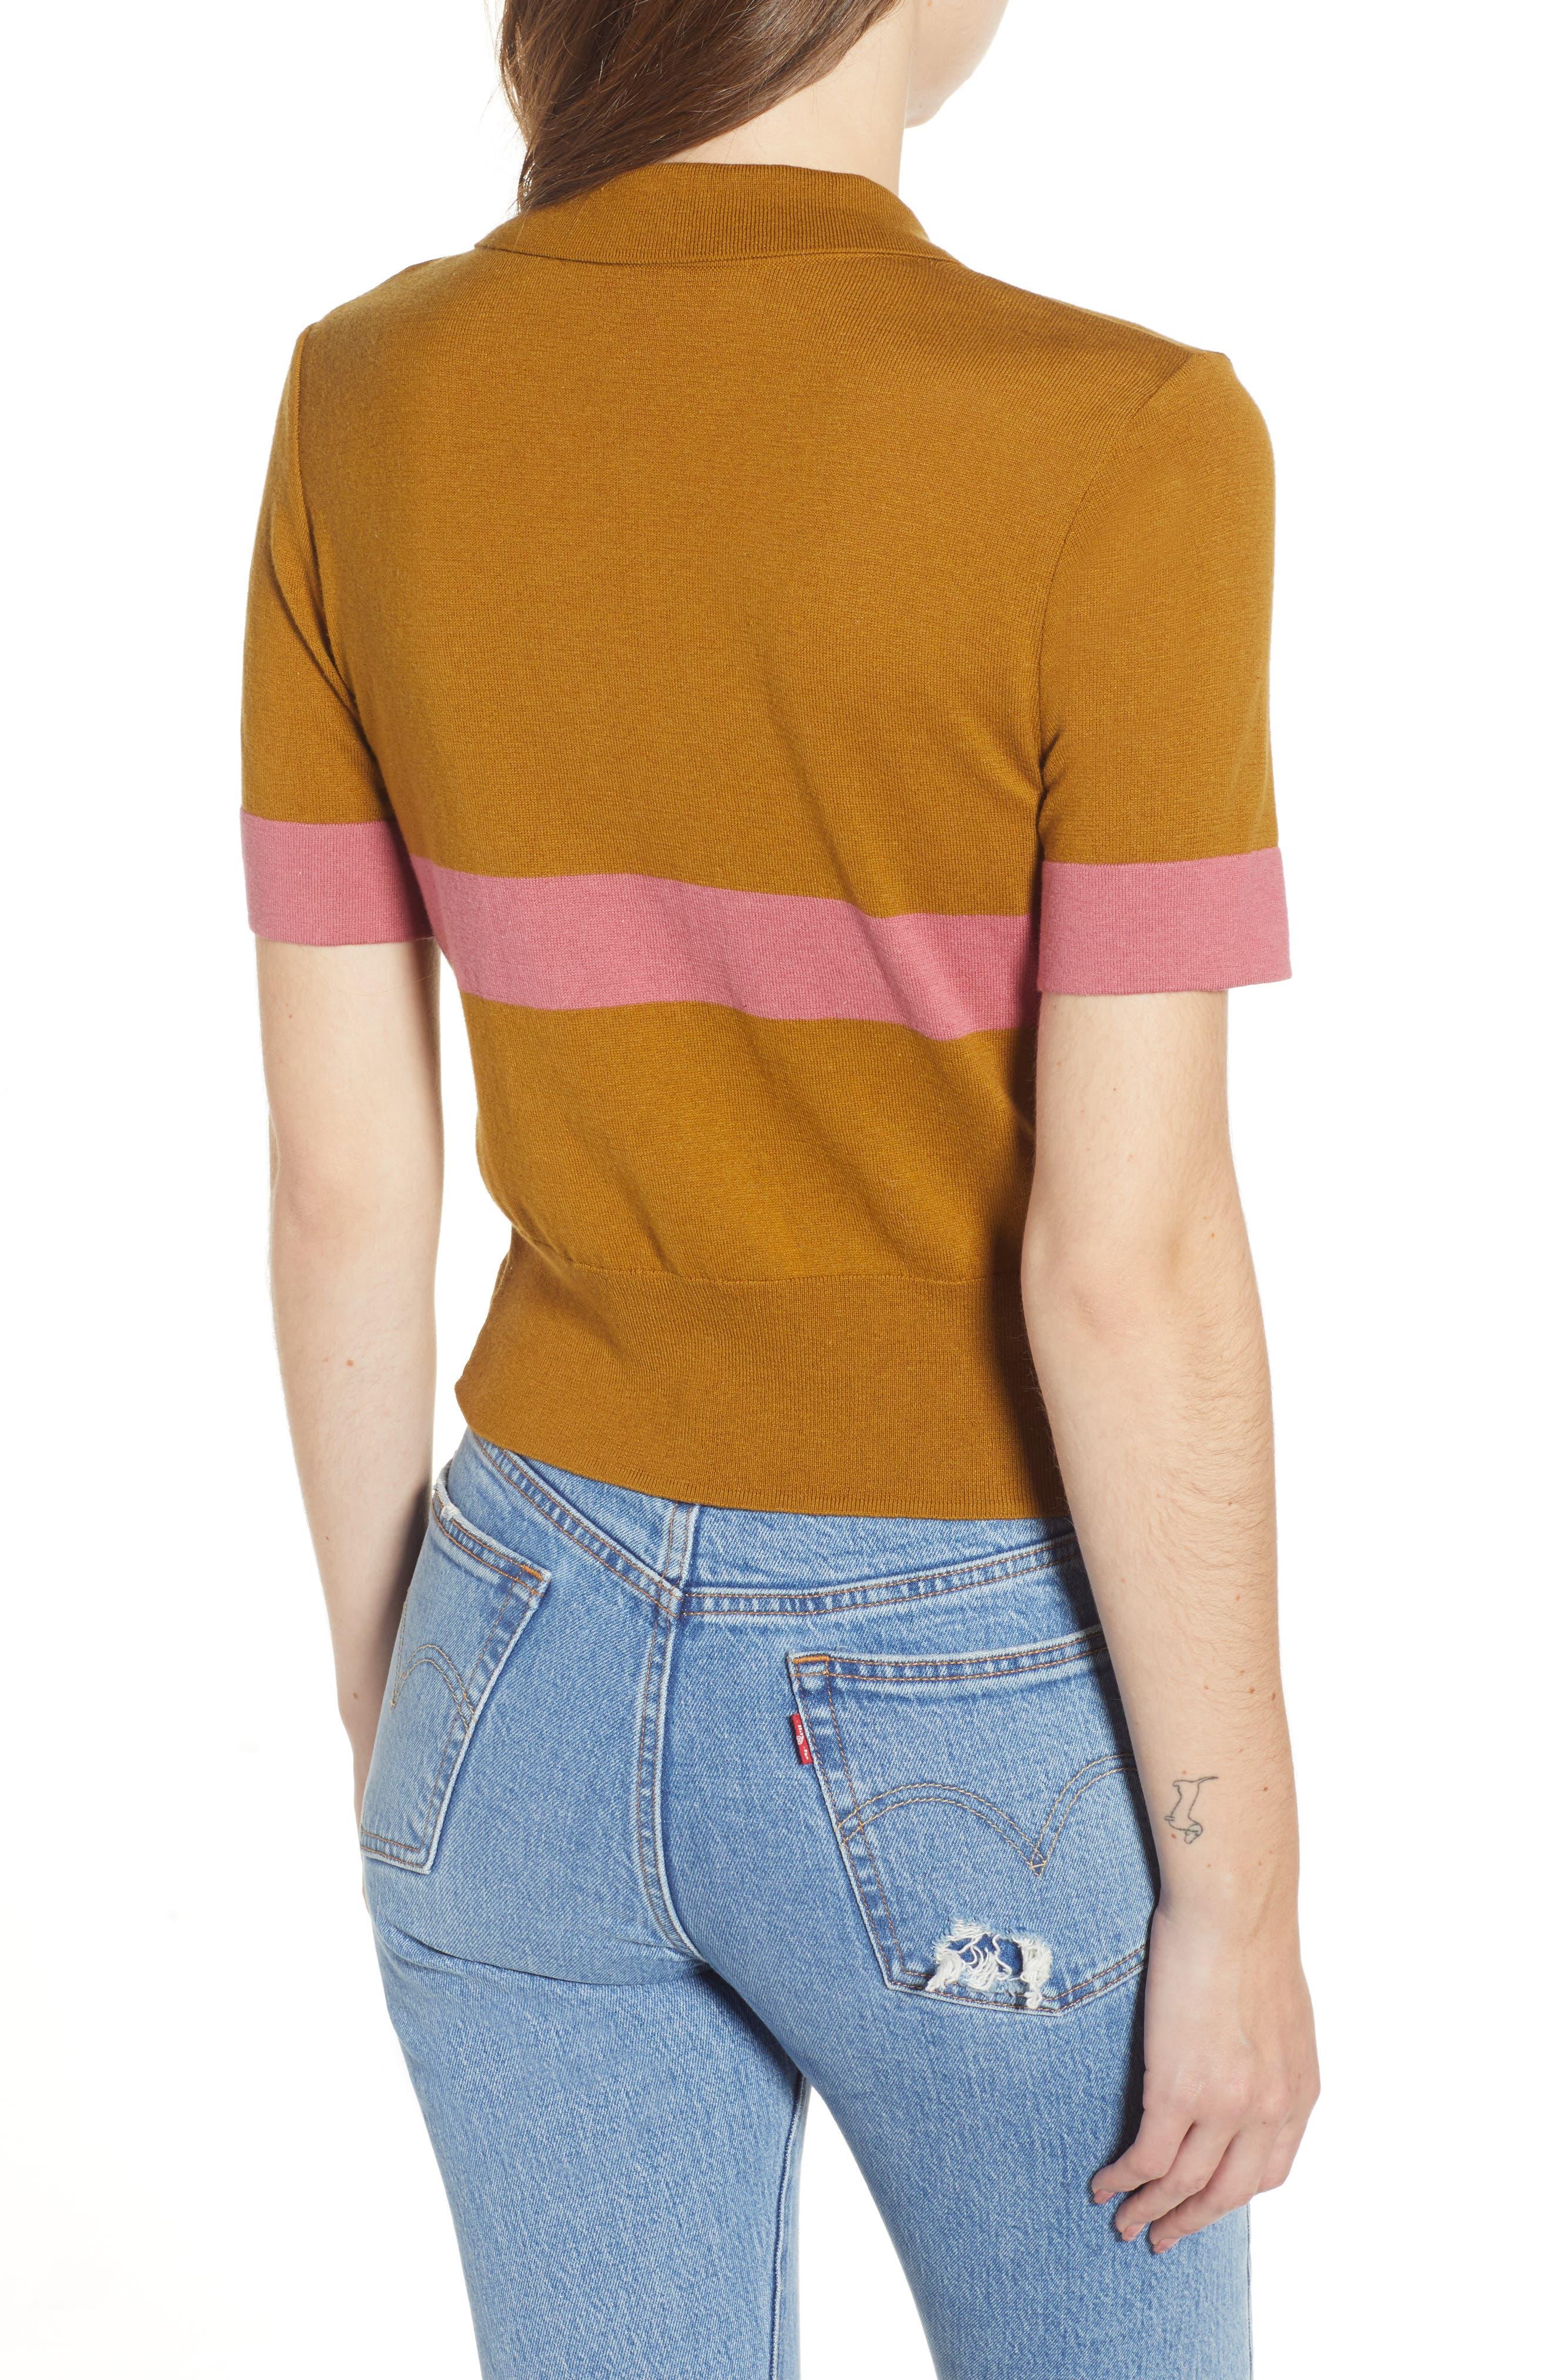 BP., Stripe Polo Sweater, Alternate thumbnail 2, color, BROWN BRONZE AIME STRIPE